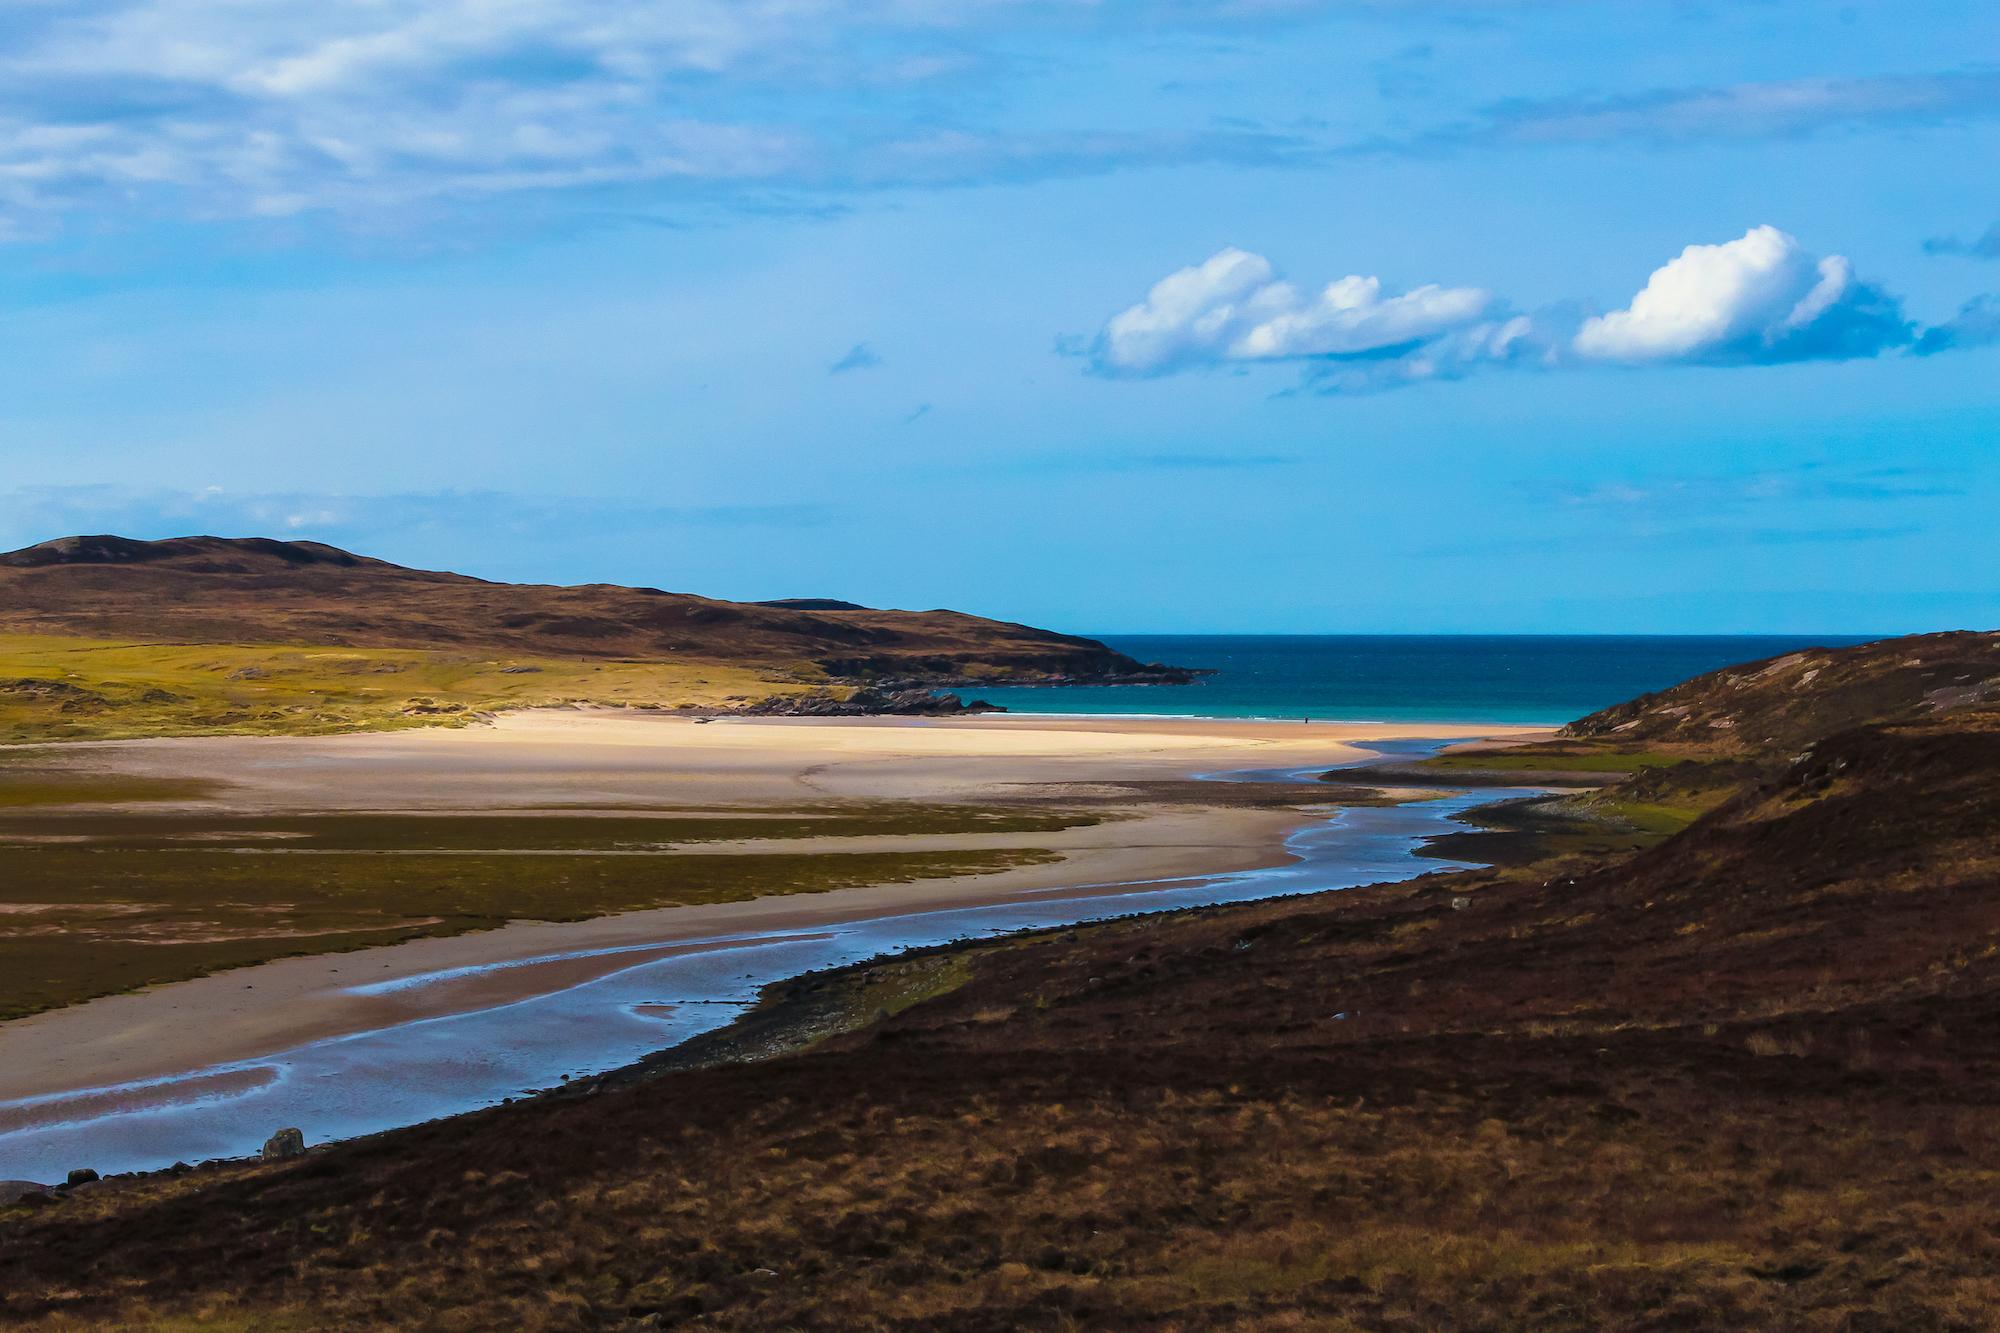 (241) Achnahaird Bay, Achiltibuie, Coigach Peninsula, Wester Ross, Scotland.jpg